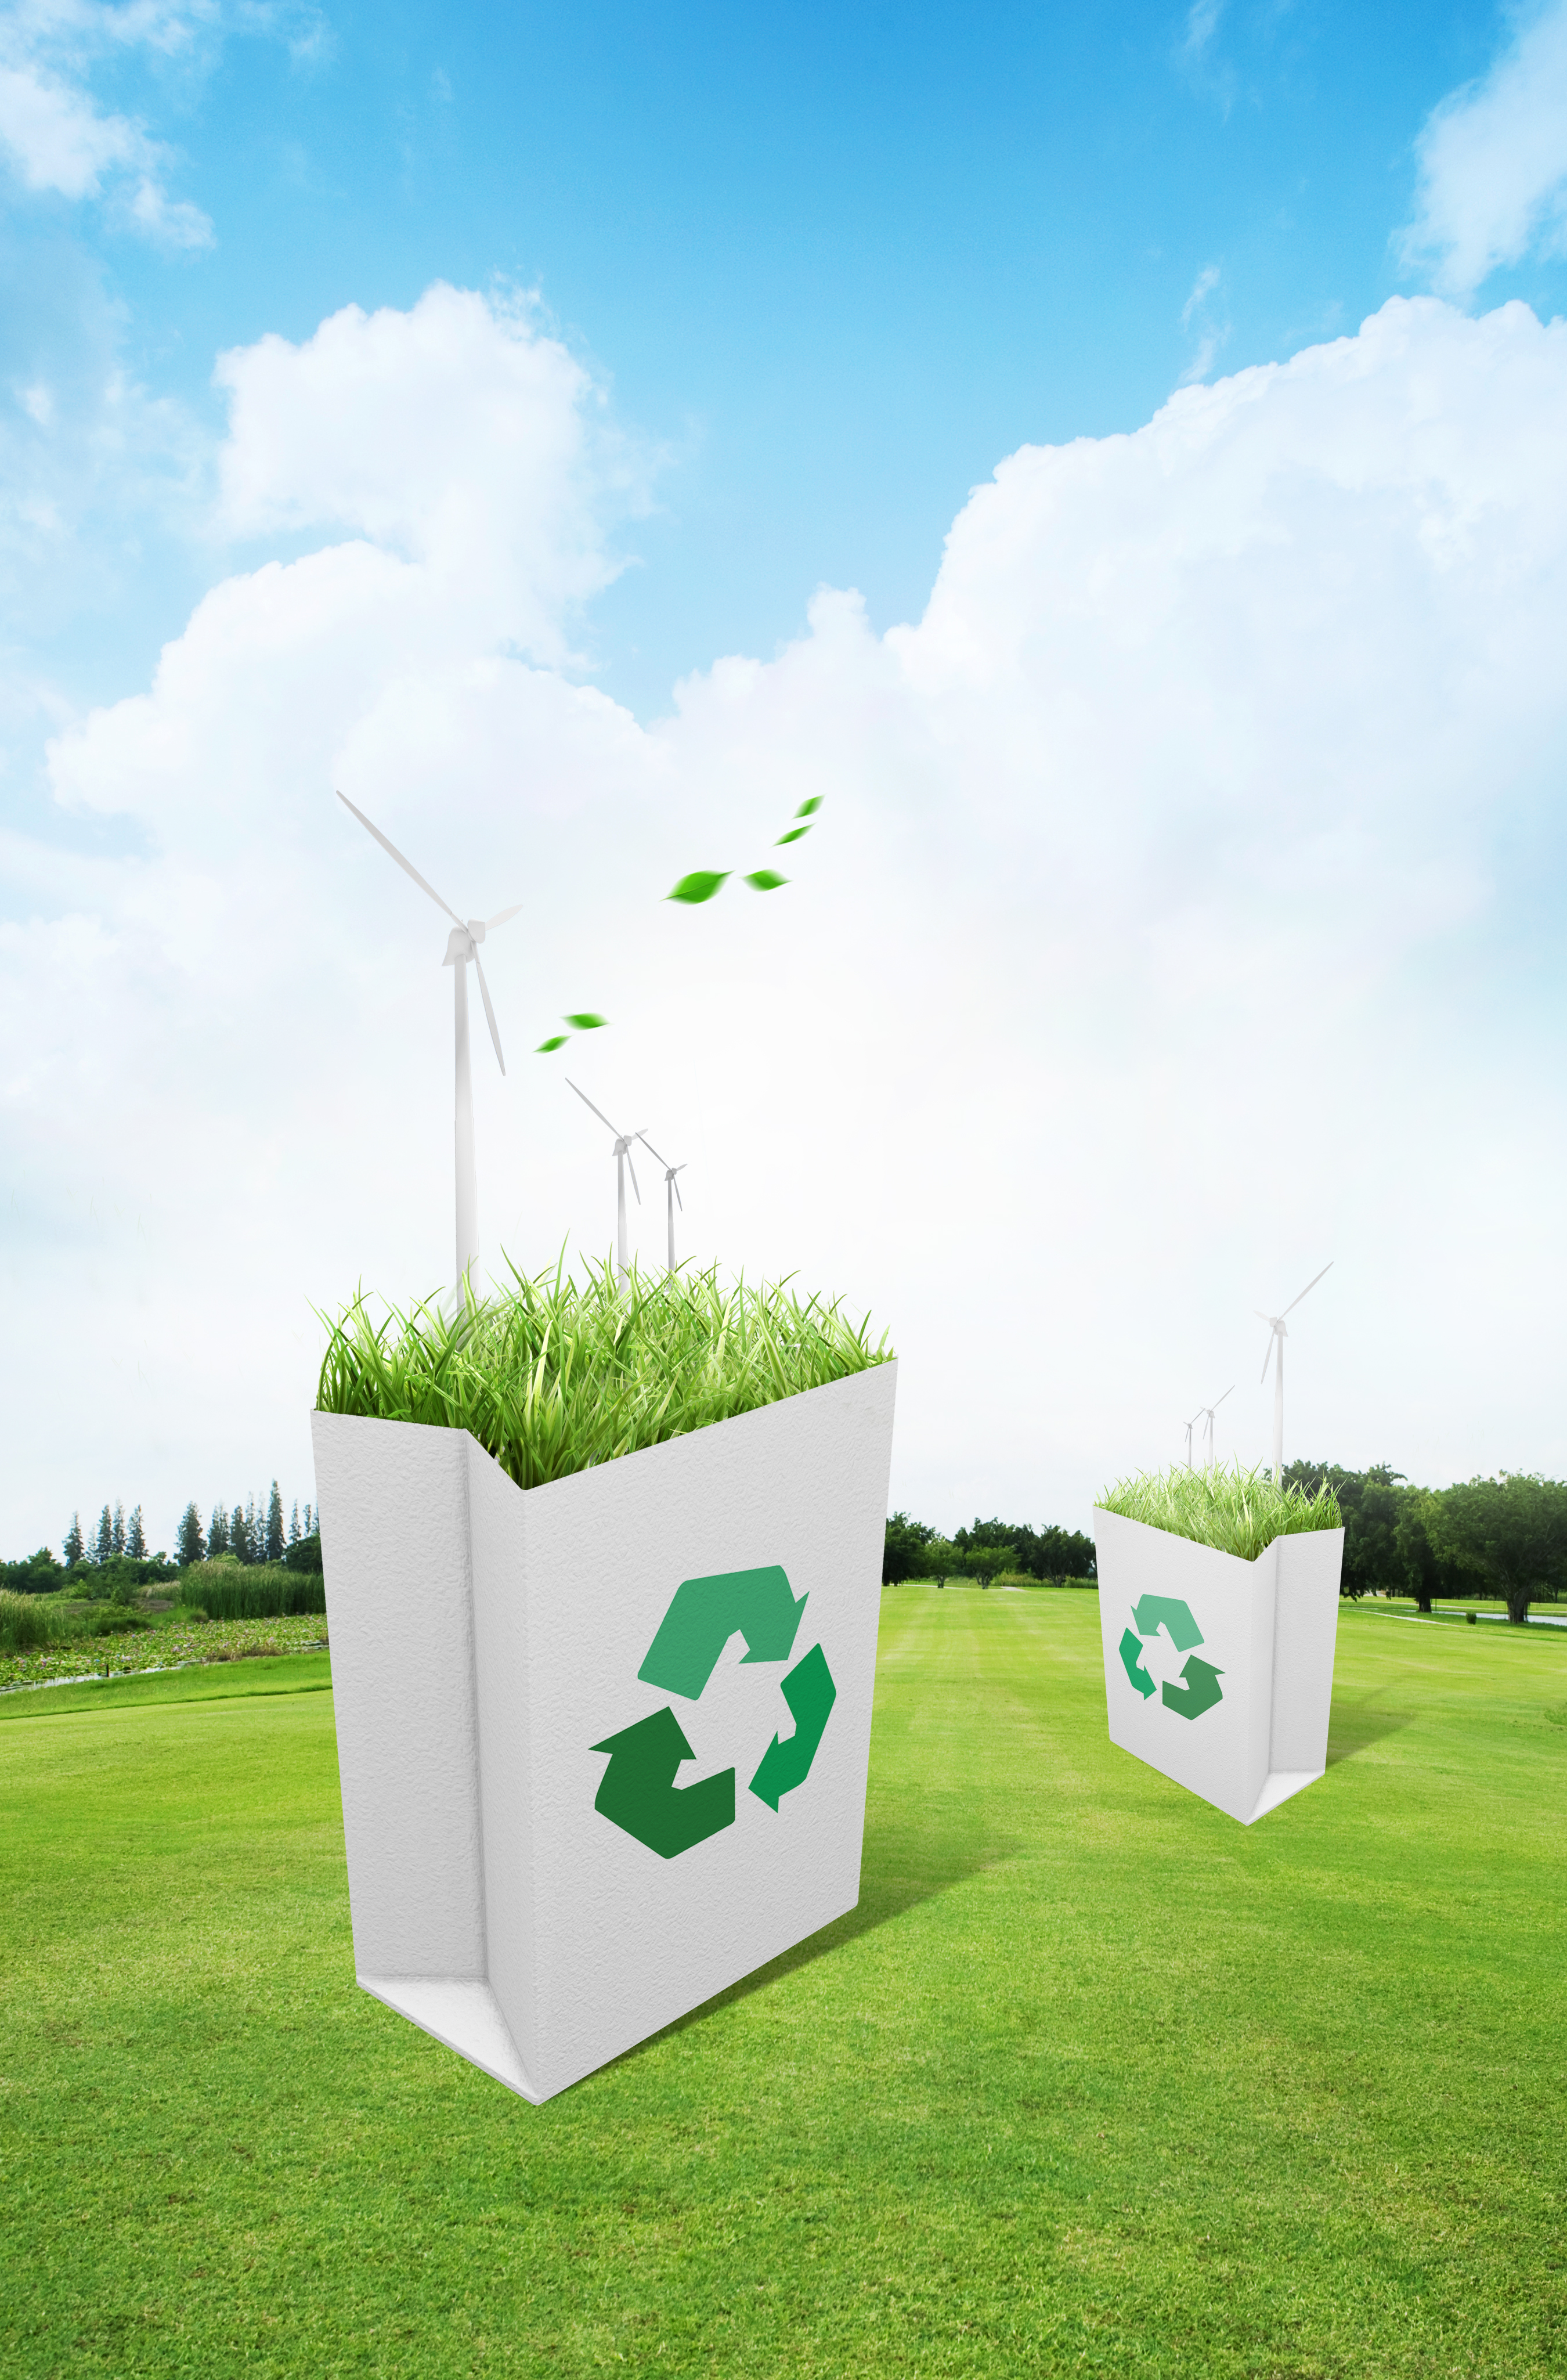 le ciel bleu de plantes de recyclage de d u00e9chets de